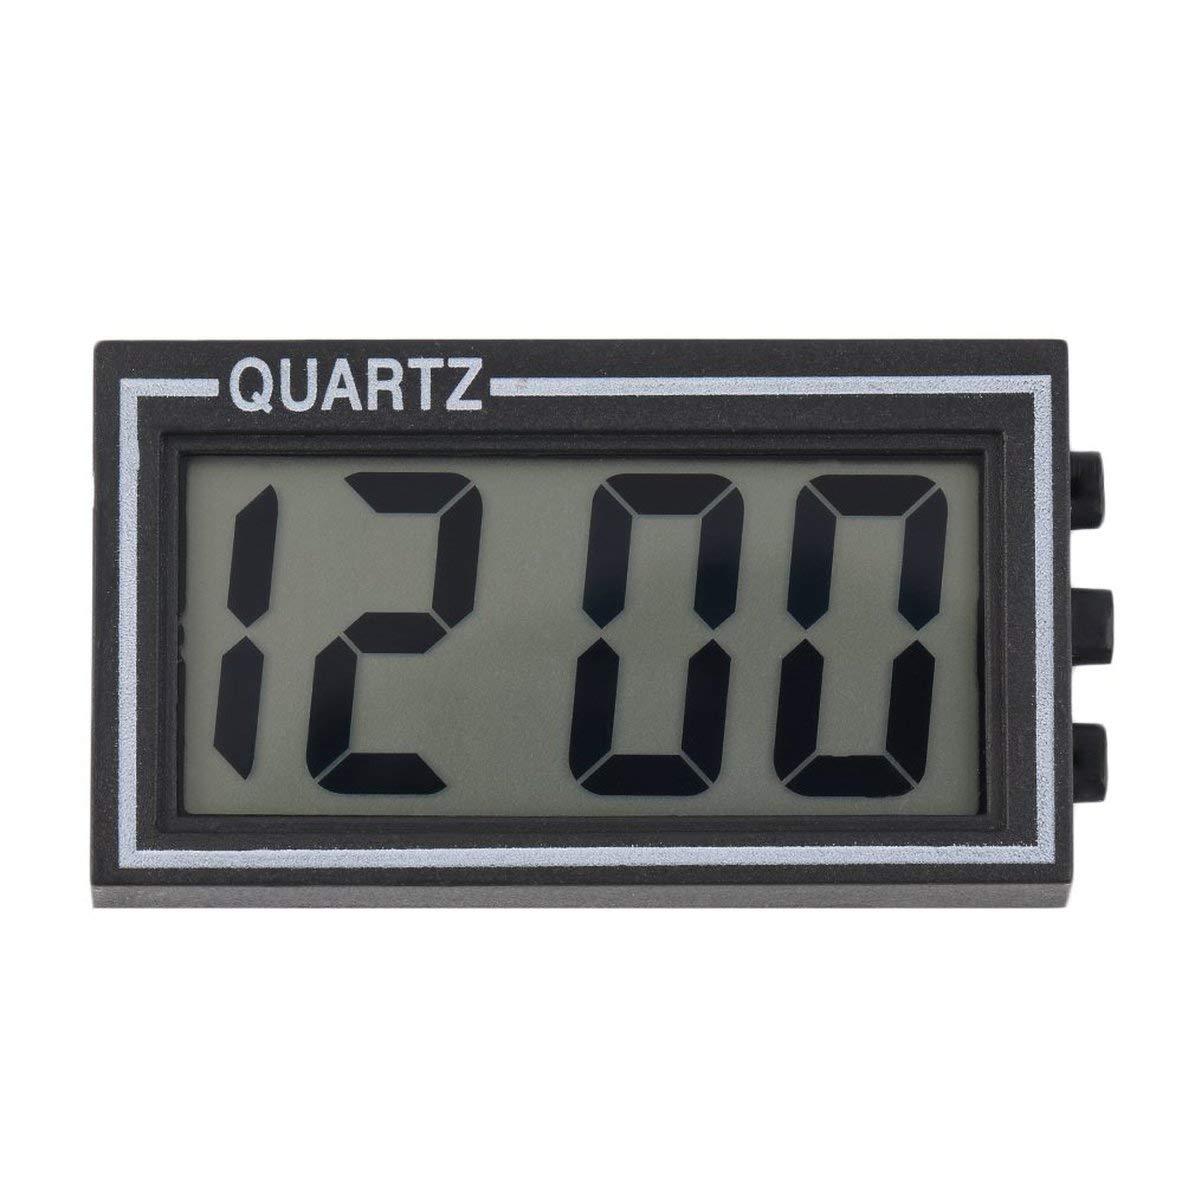 Corneliaa-UK Black Digital LCD Table Car Dashboard Desk Date Time Calendar Small Clock